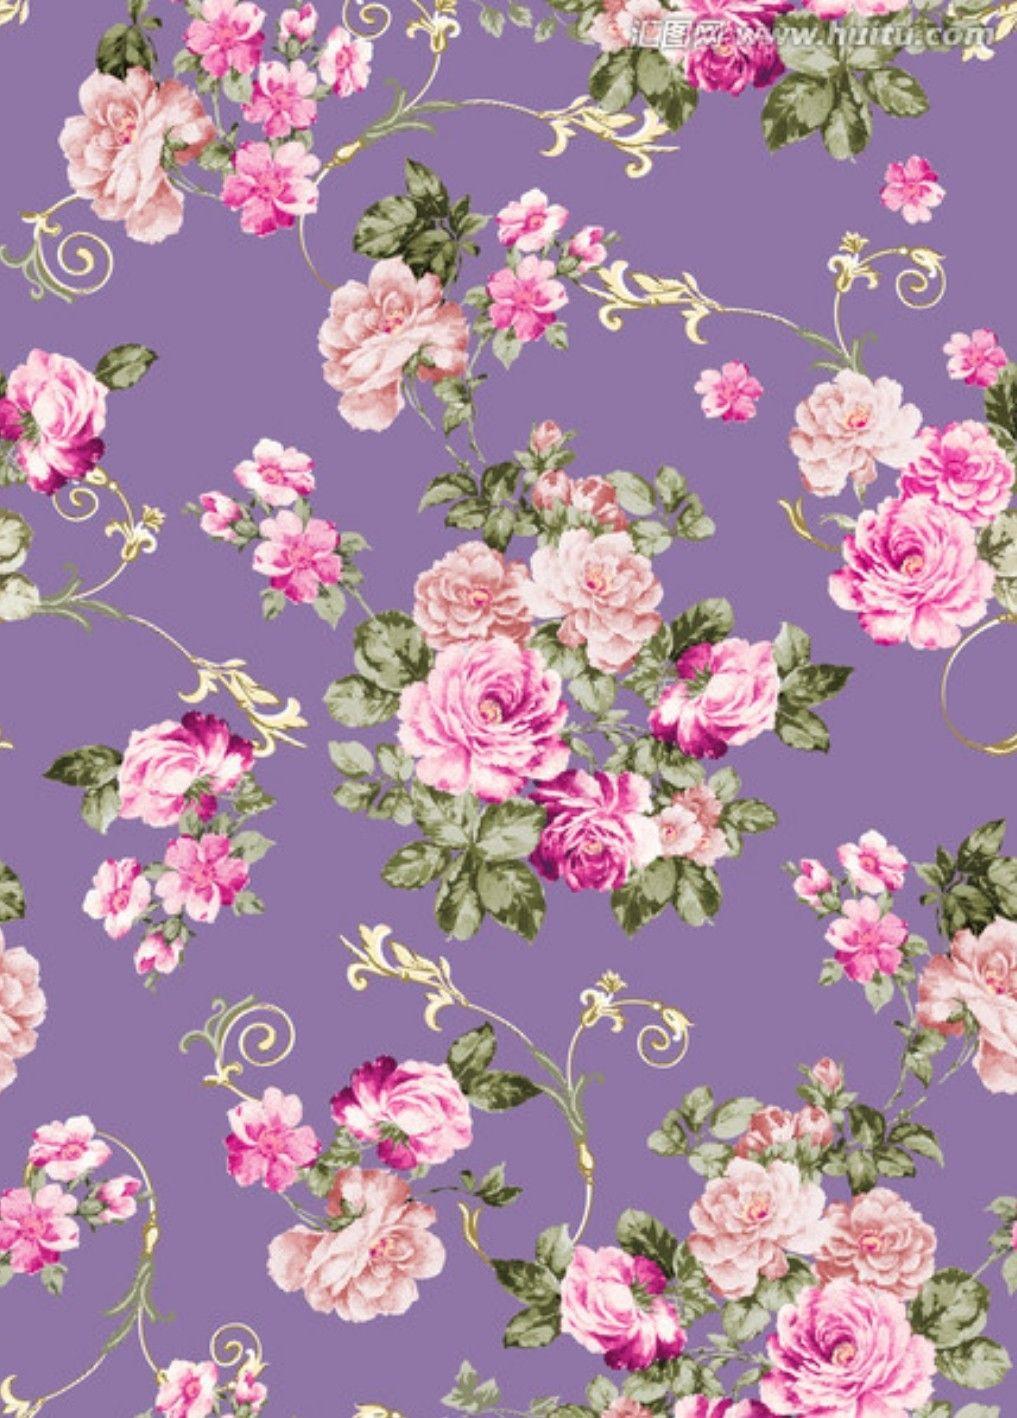 Pin By Debbie Ostrowski Barton On Pattern Florals 8 Flower Background Wallpaper Vintage Flowers Wallpaper Flower Wallpaper